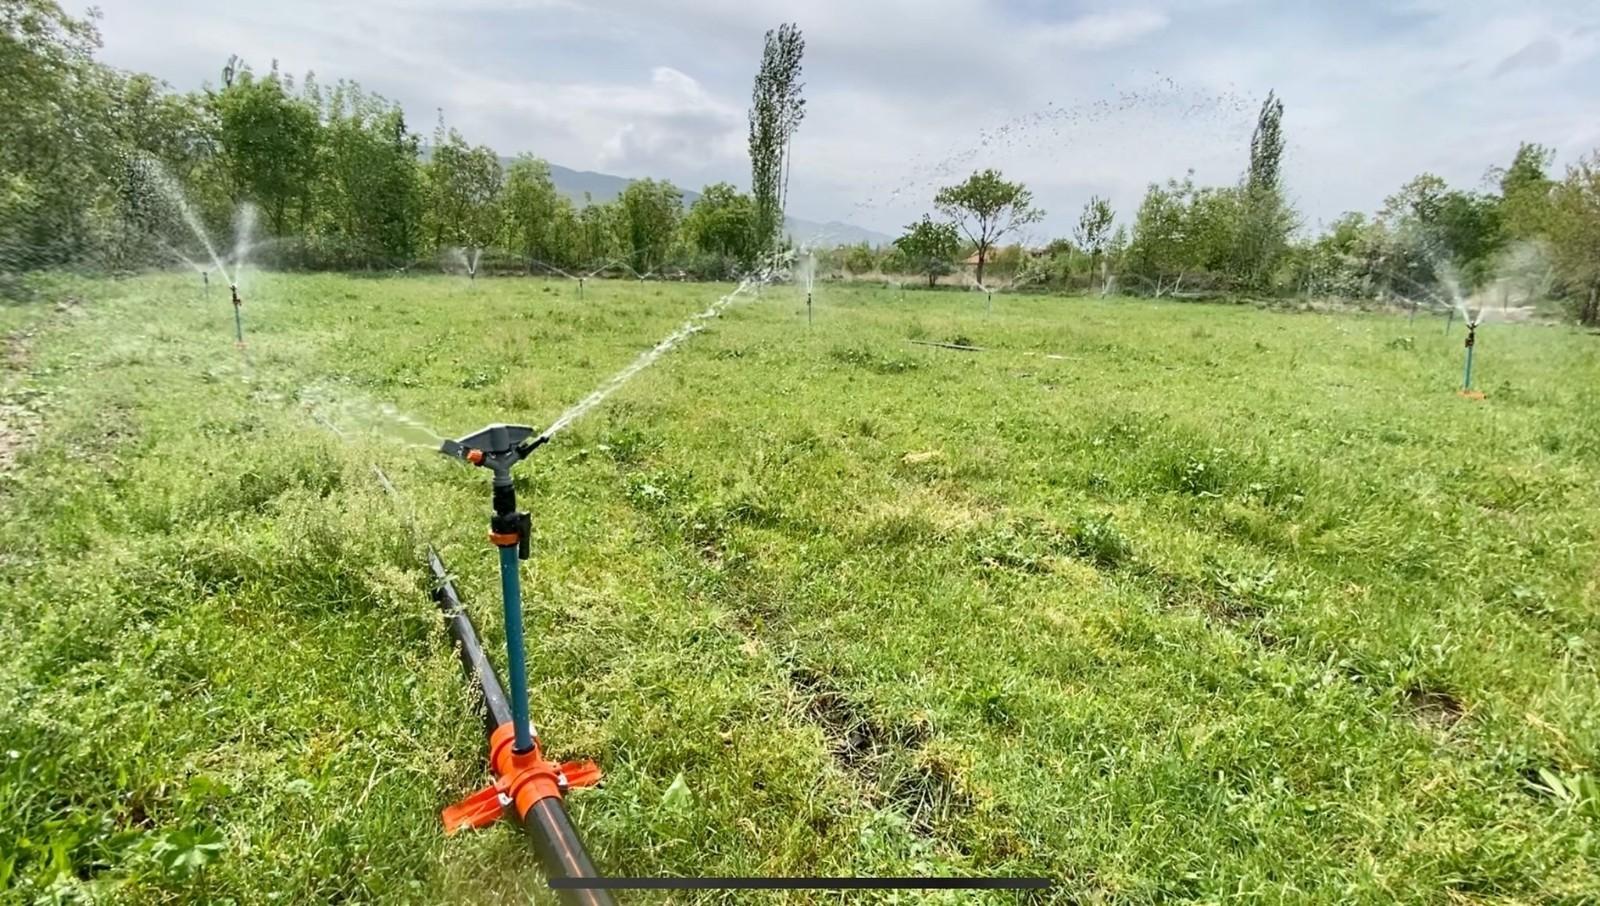 Afyonkarahisar'da bu sezon 590 bin dekar tarım arazisi sulanacak